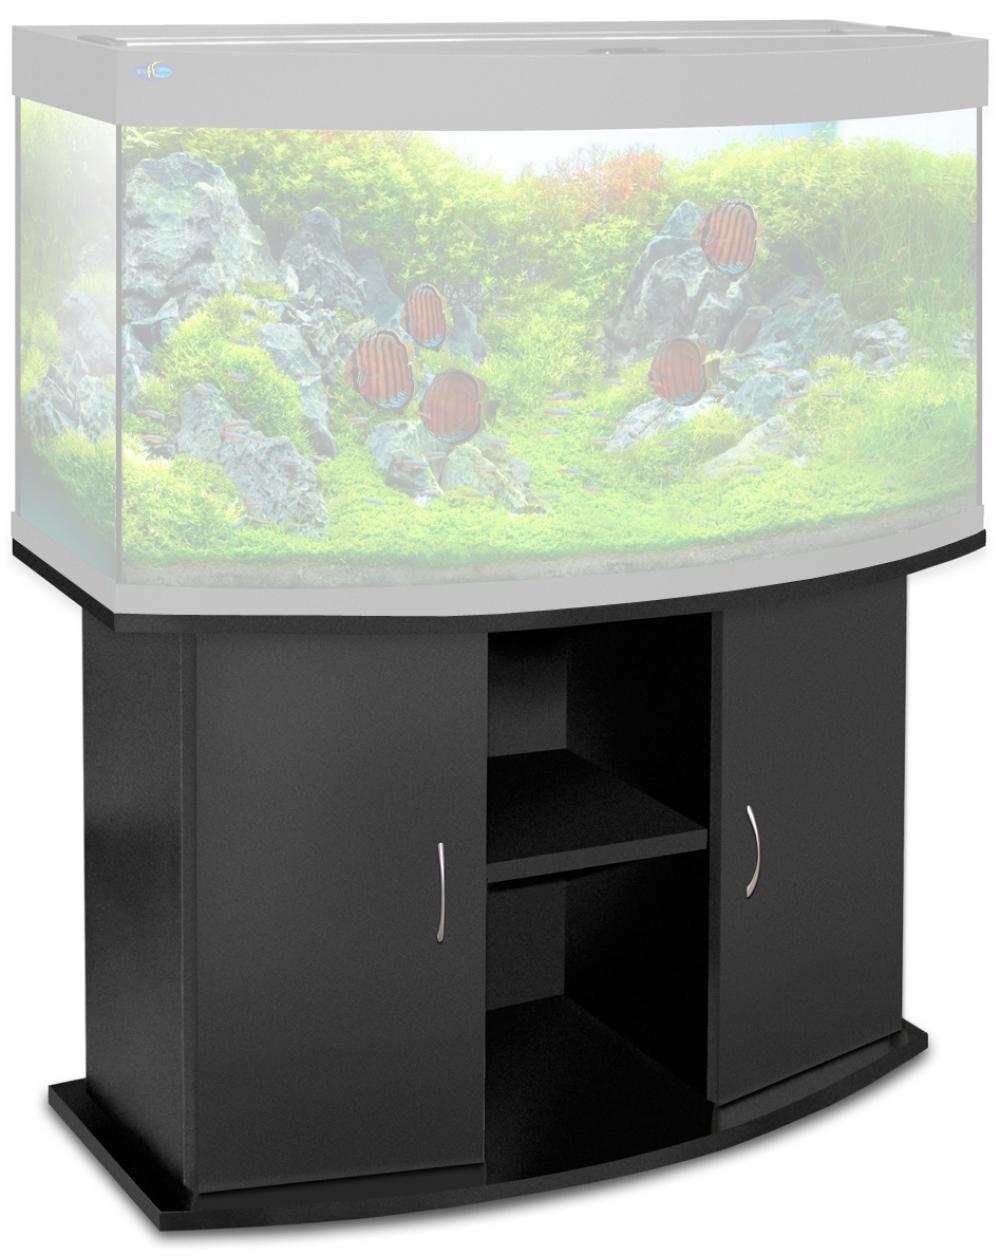 Тумба из дсп под аквариум 43